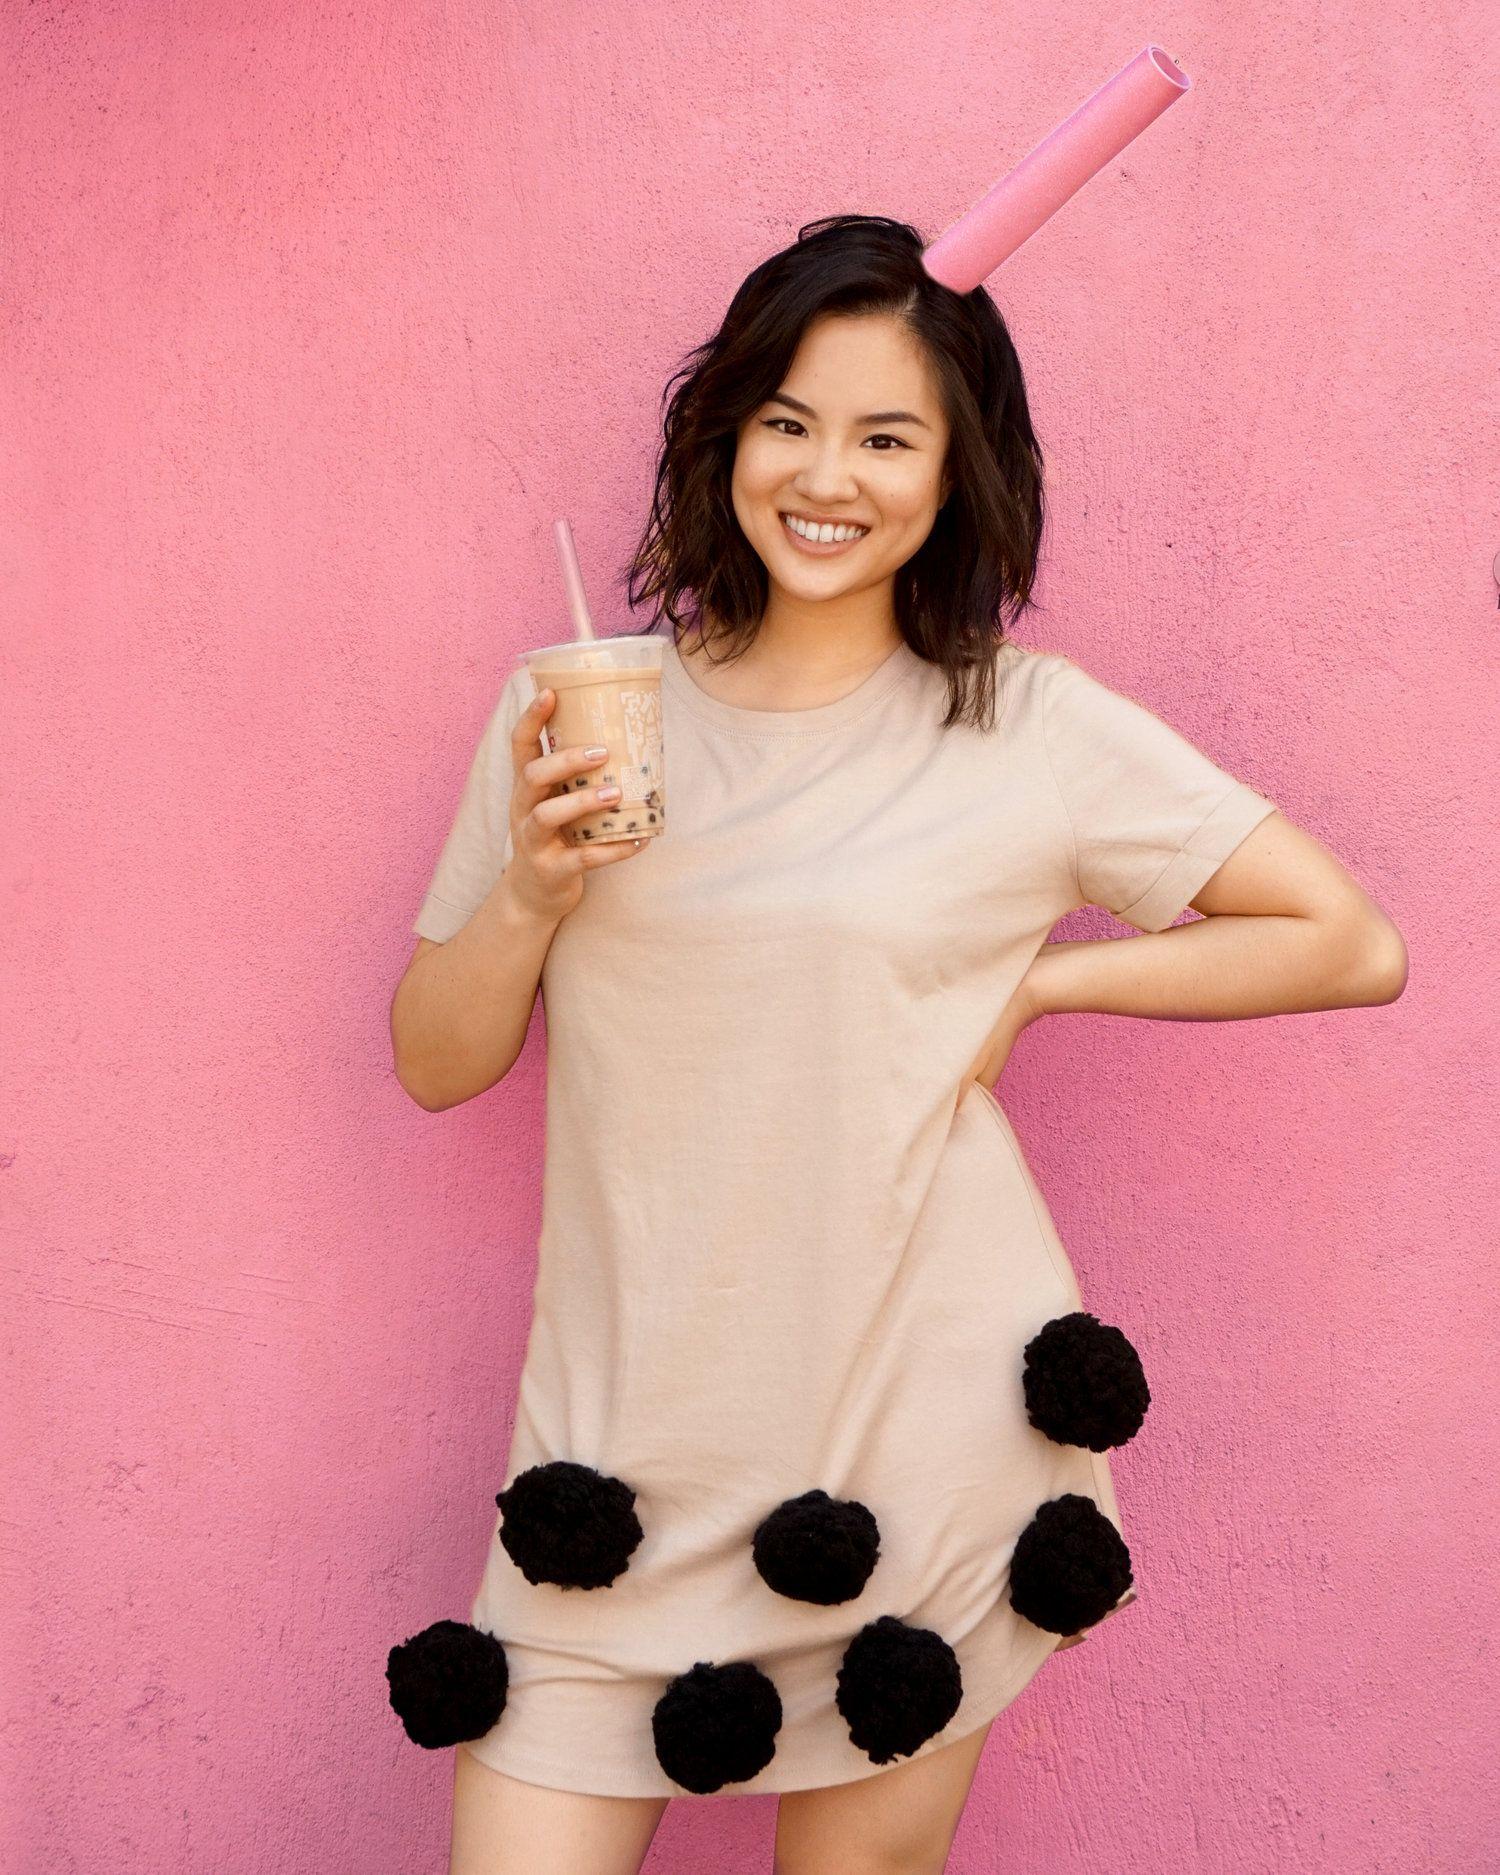 Boba Milk Tea Halloween DIY Costume Tutorial | Celebrity ...